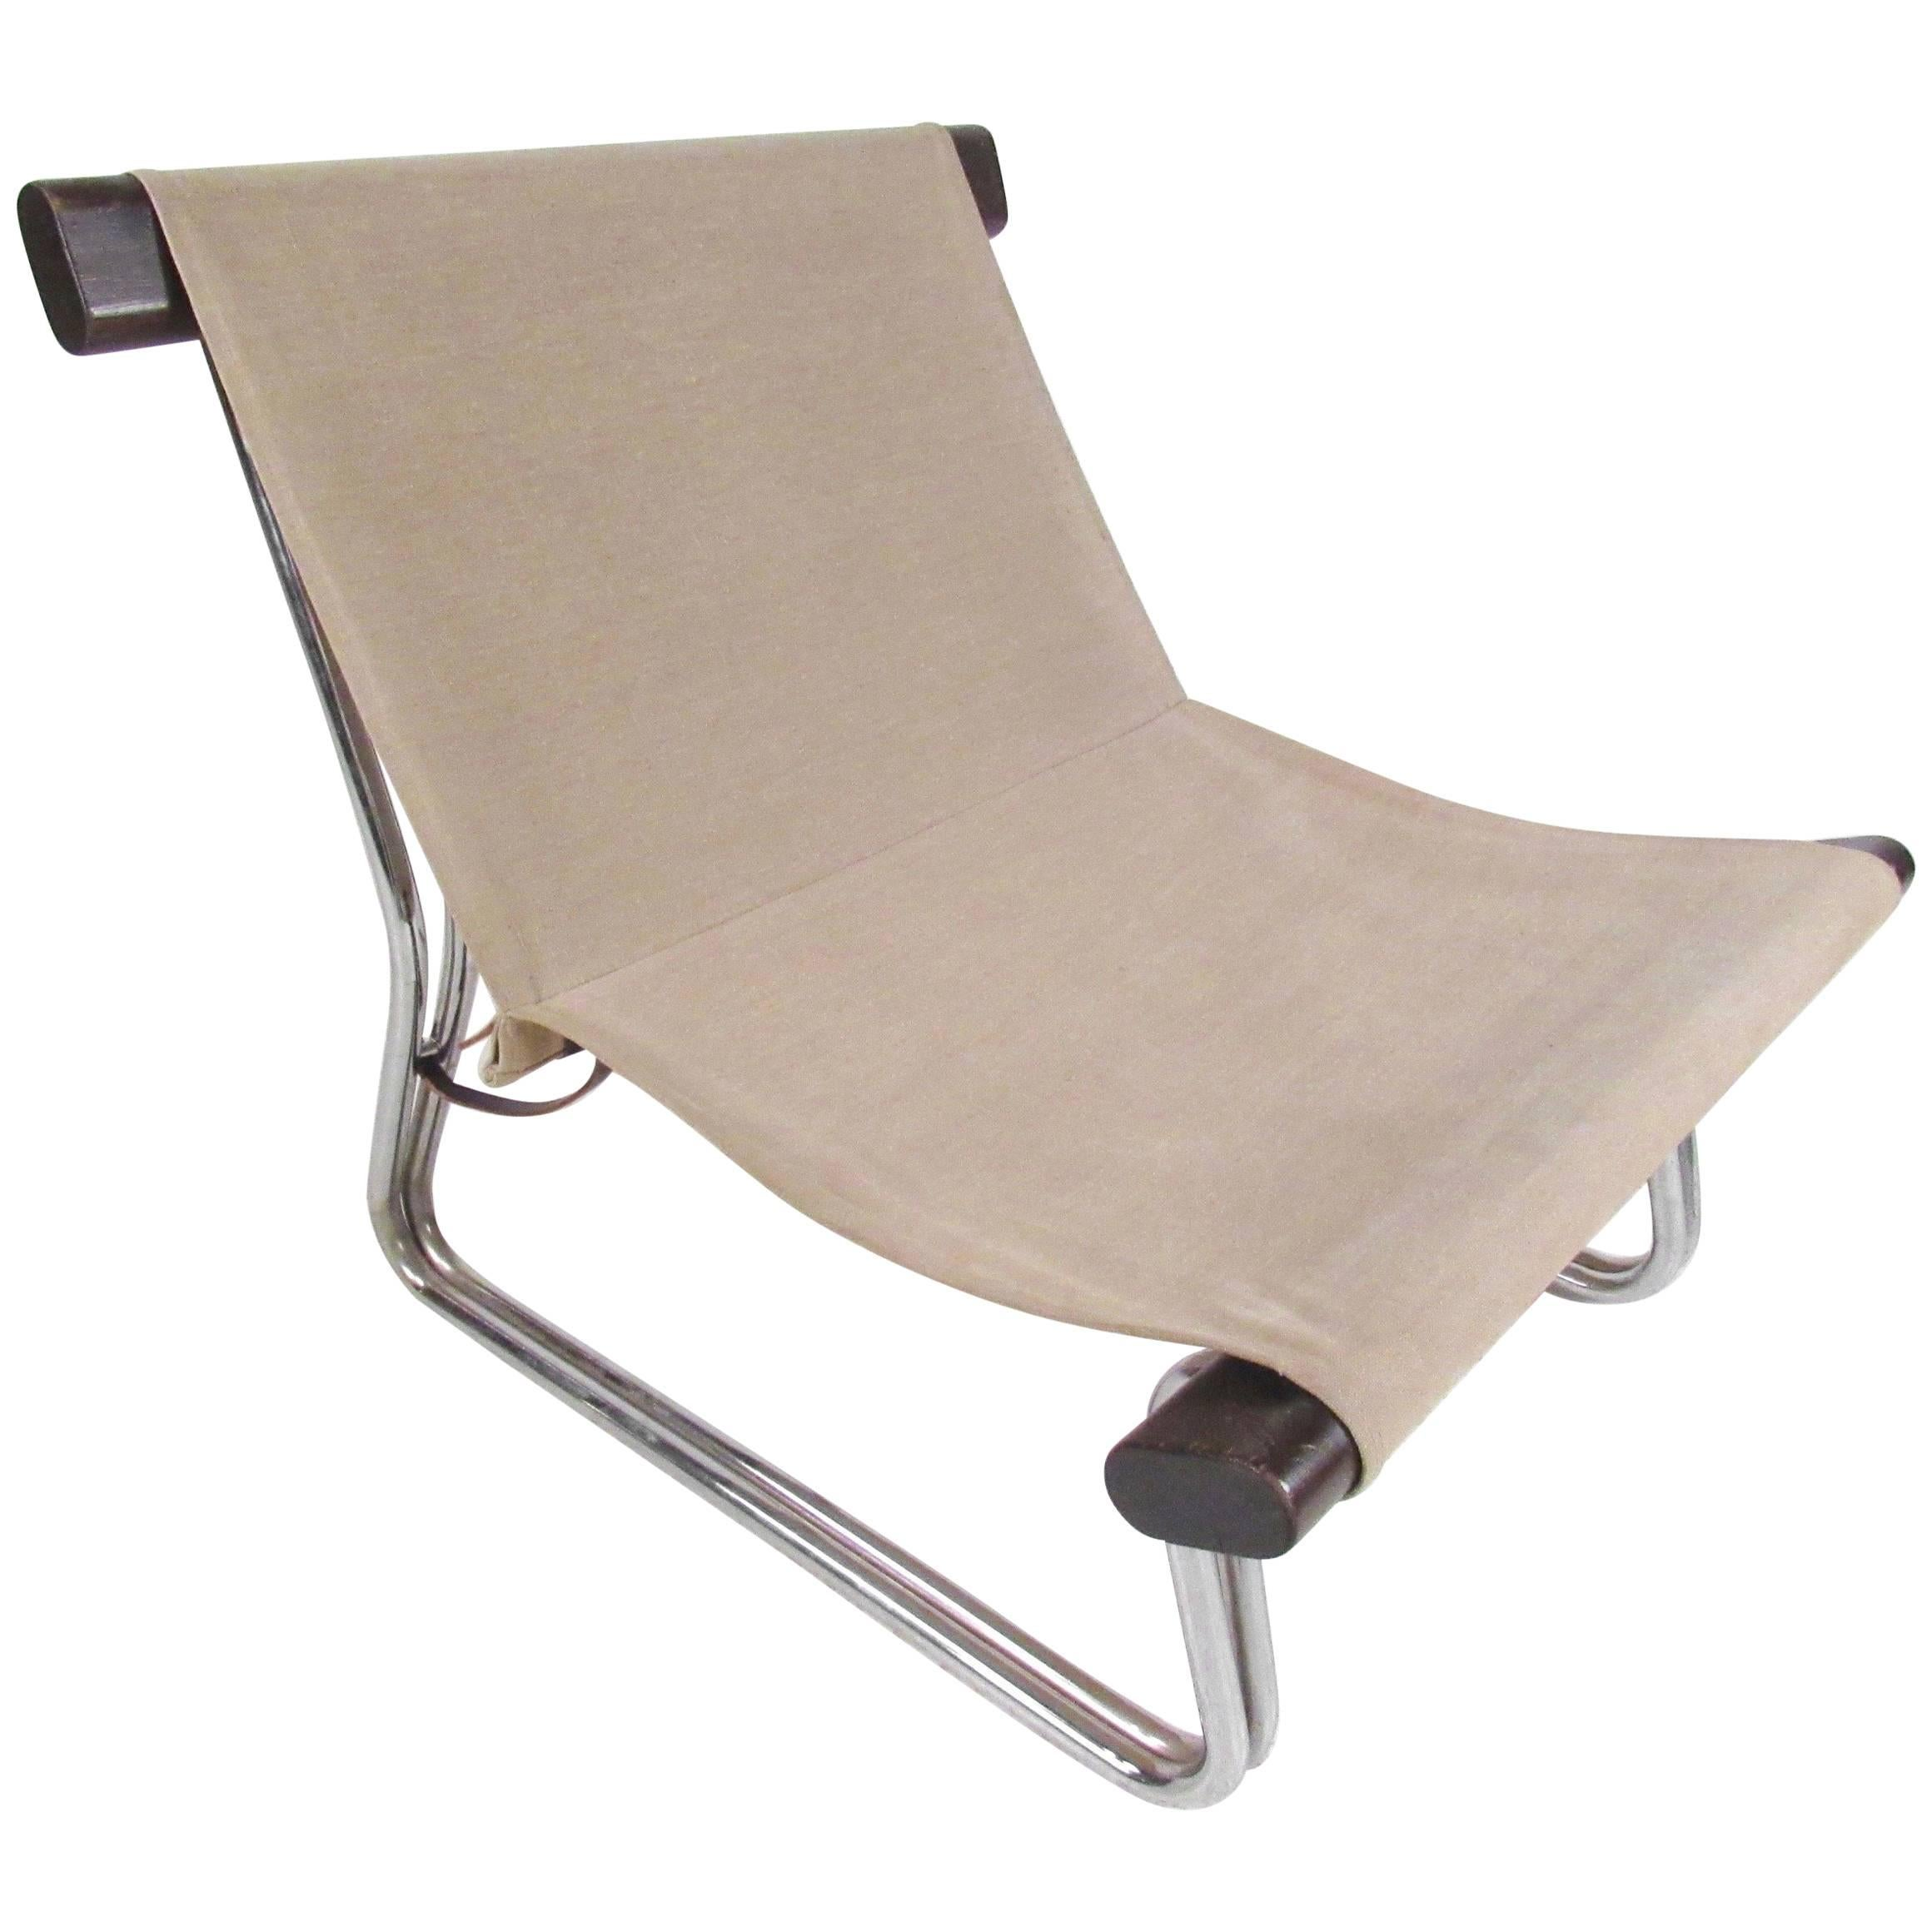 Scandinavian Modern Canvas And Chrome Sling Chair